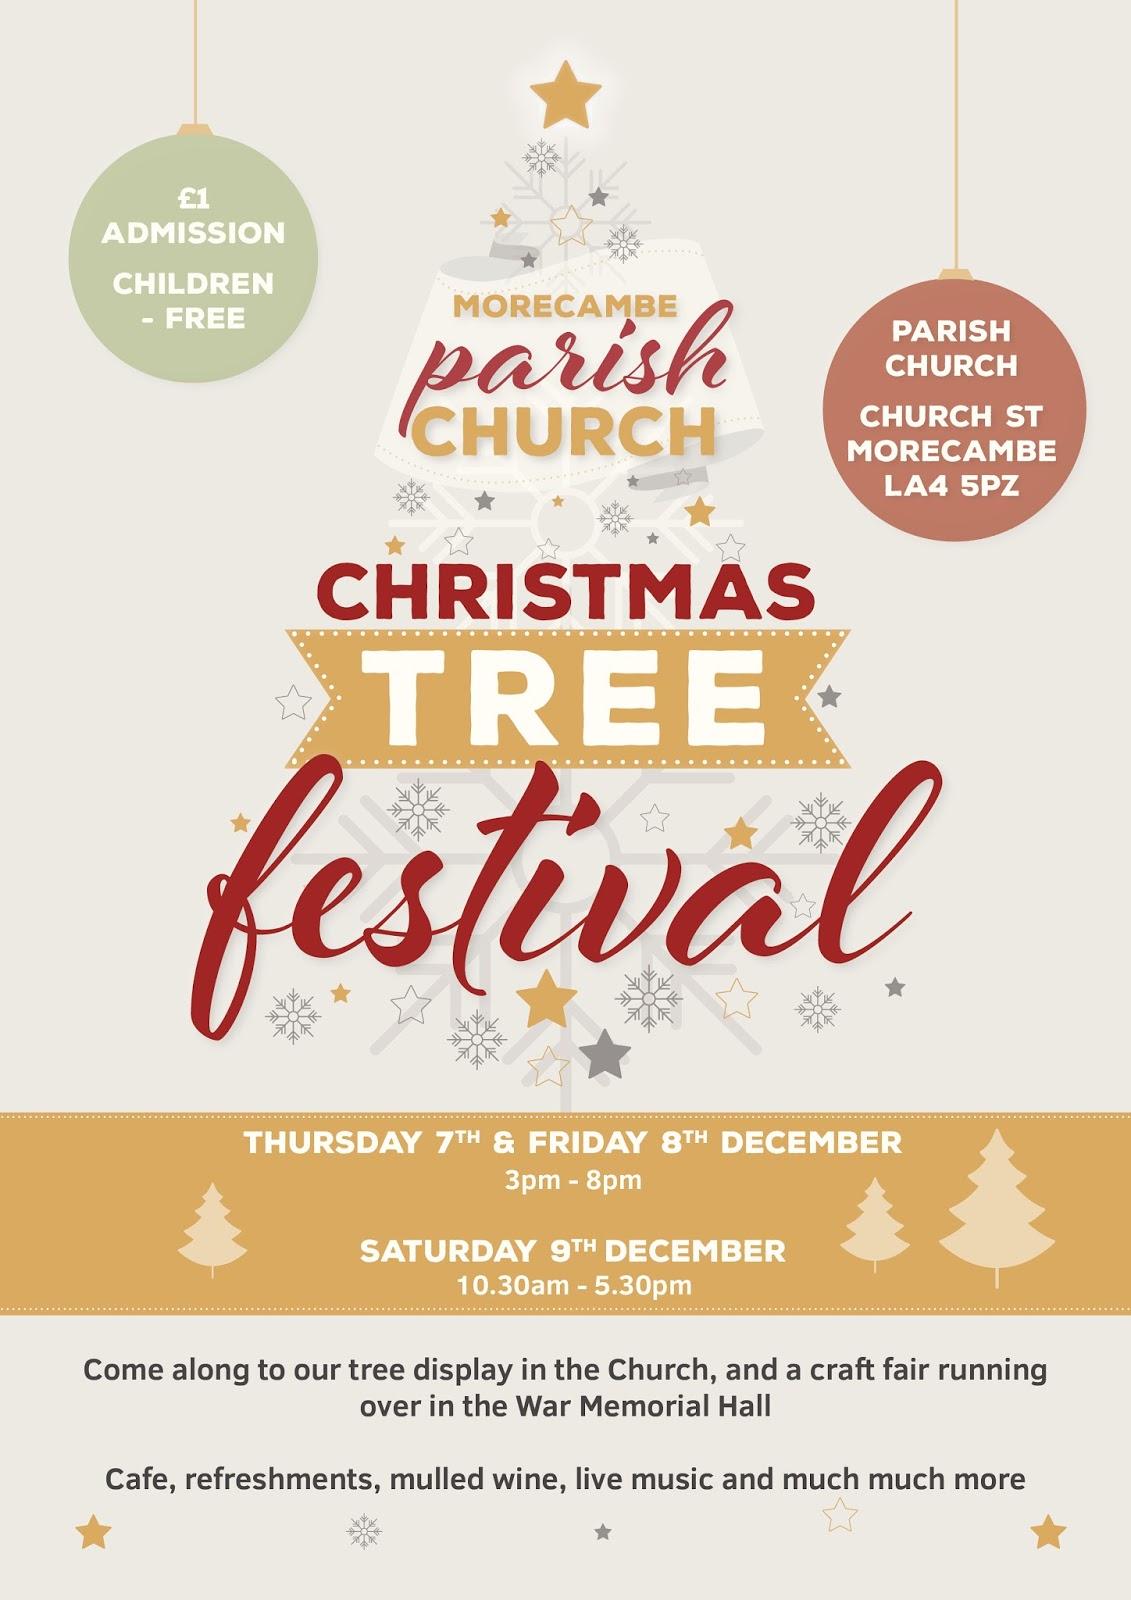 Christmas Craft Show Flyer.Morecambe Churches Forum Christmas Tree Festival And Craft Fair